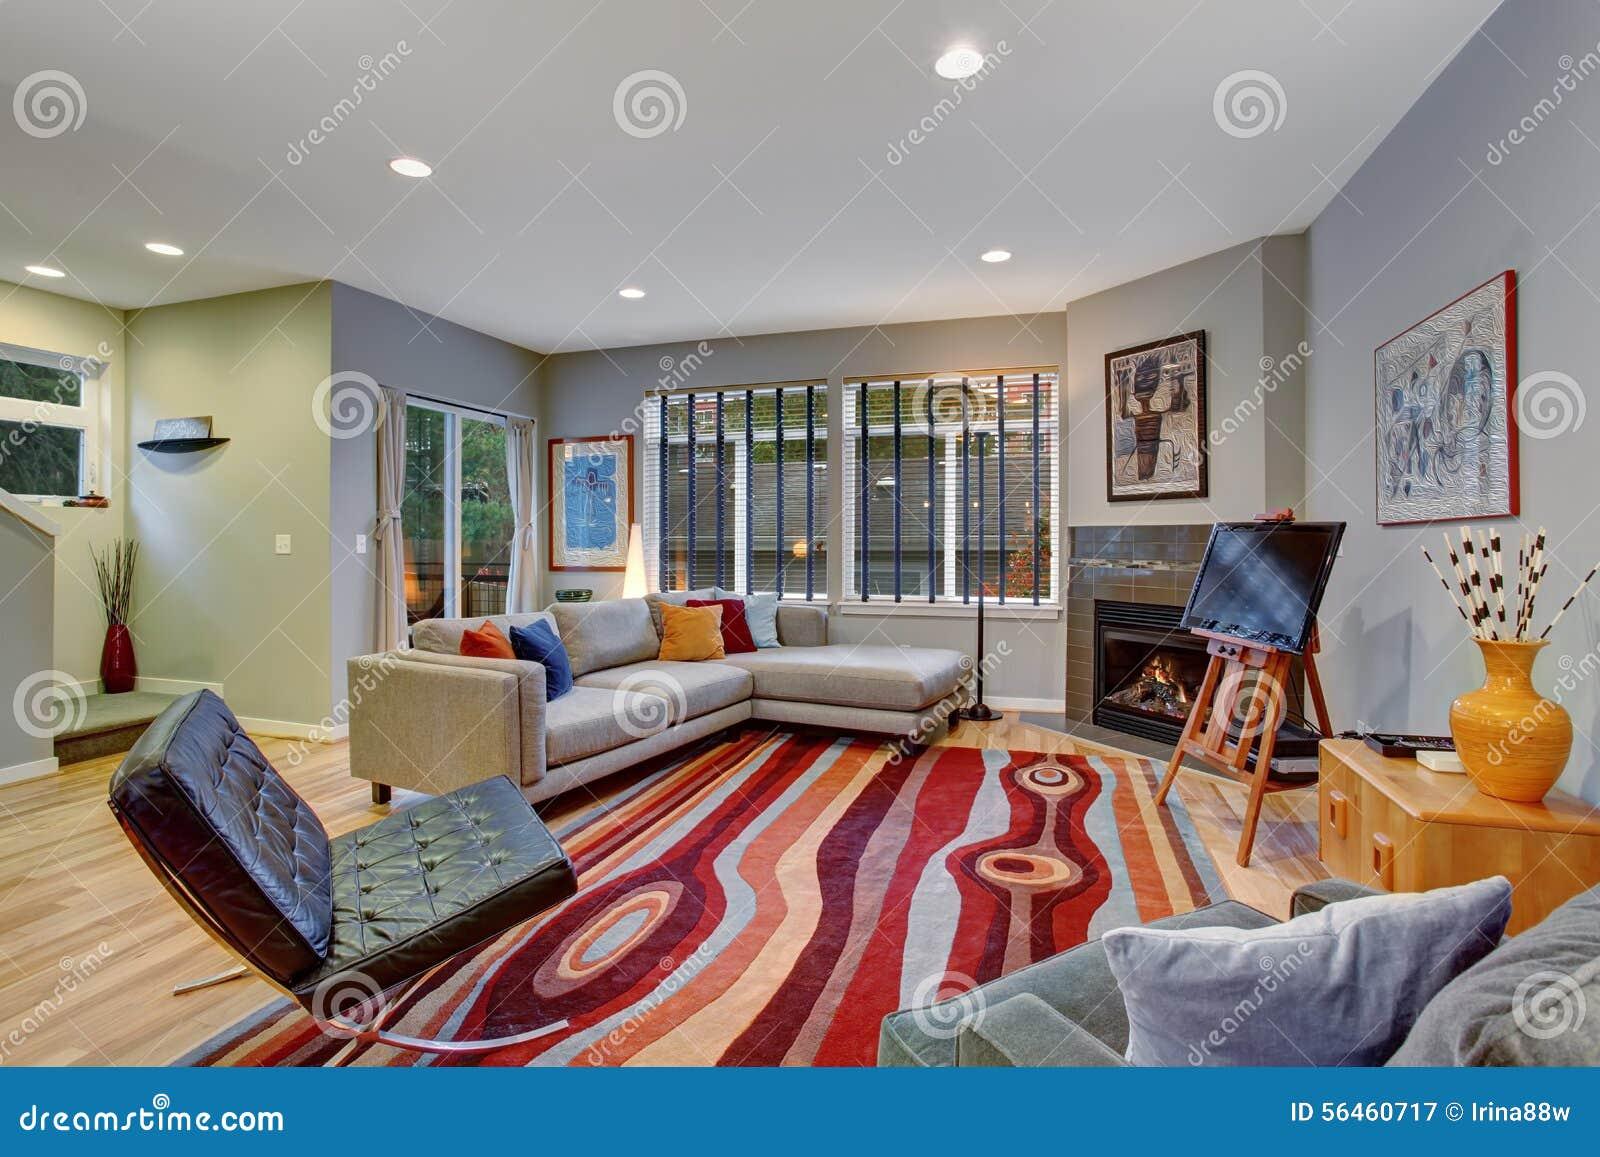 Woonkamer kleuren decor - Kleur verf moderne woonkamer ...